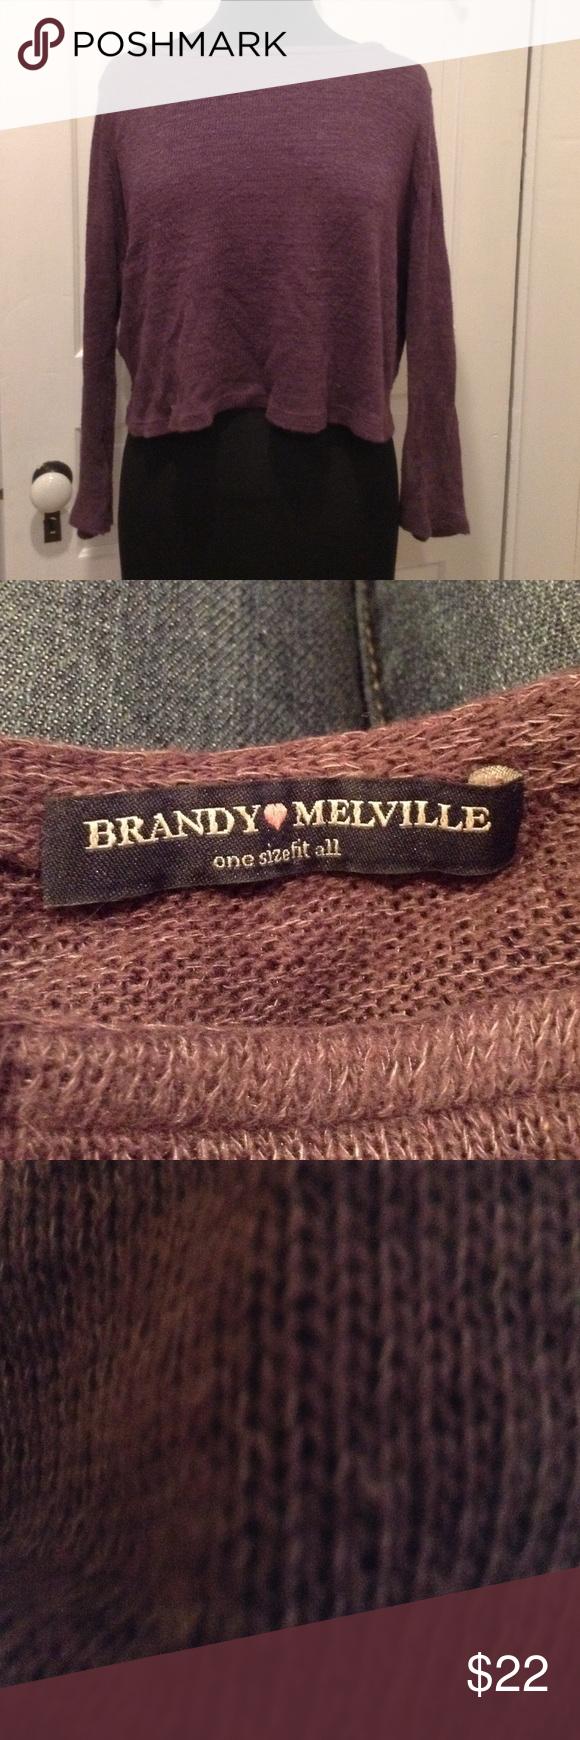 Brandy Melville sweater Brandy Melville purple sweater used once Brandy Melville Sweaters Crew & Scoop Necks